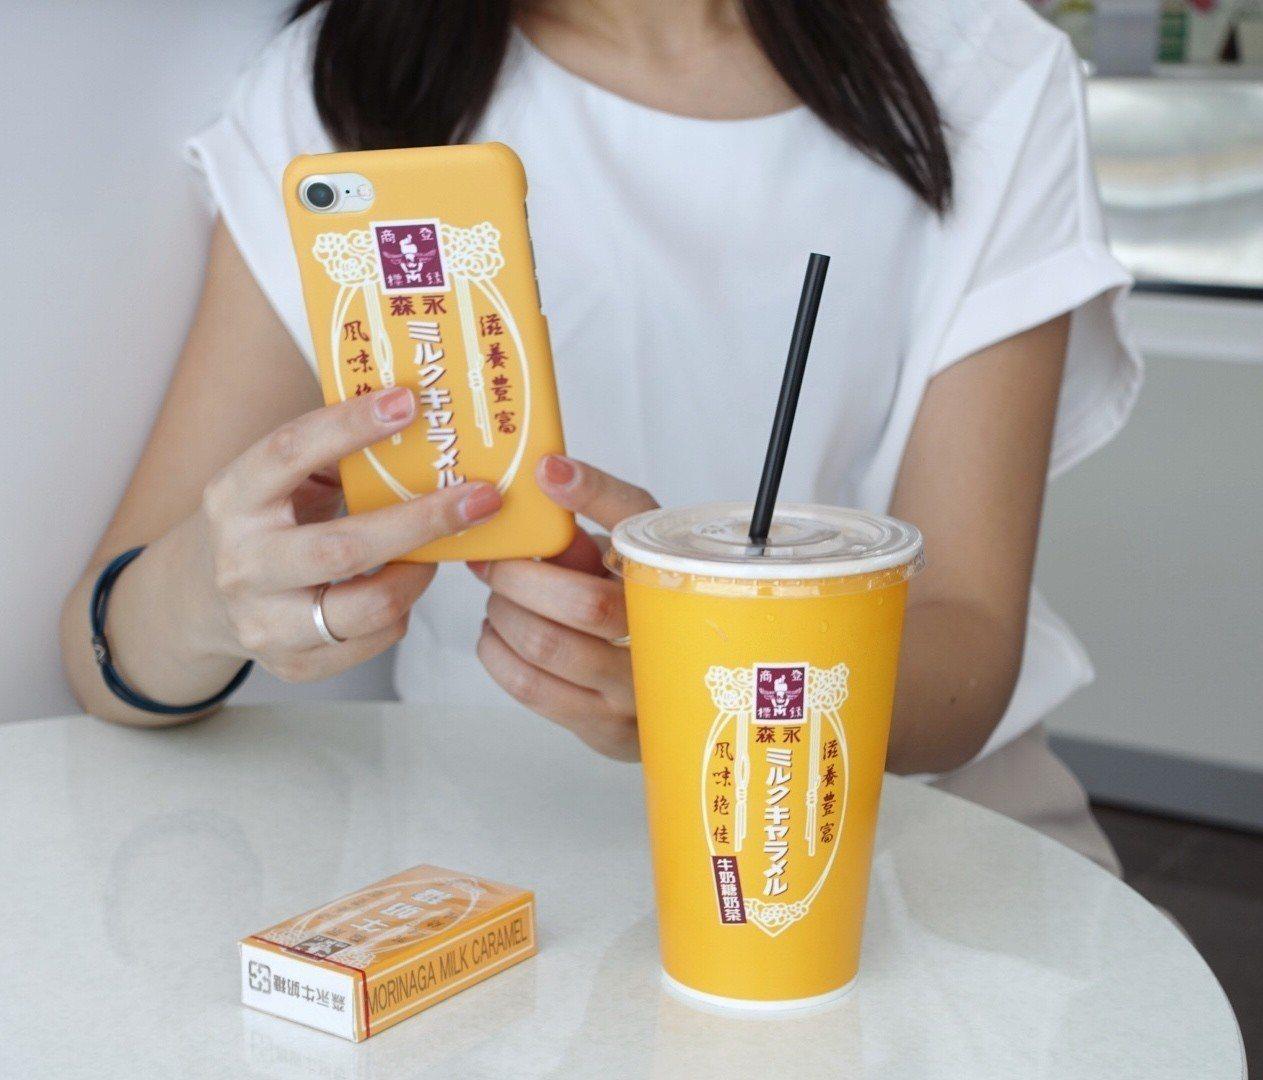 7-ELEVEN二度攜手日本零食大廠「森永」推出冰的森永牛奶糖奶茶,大杯65元,...